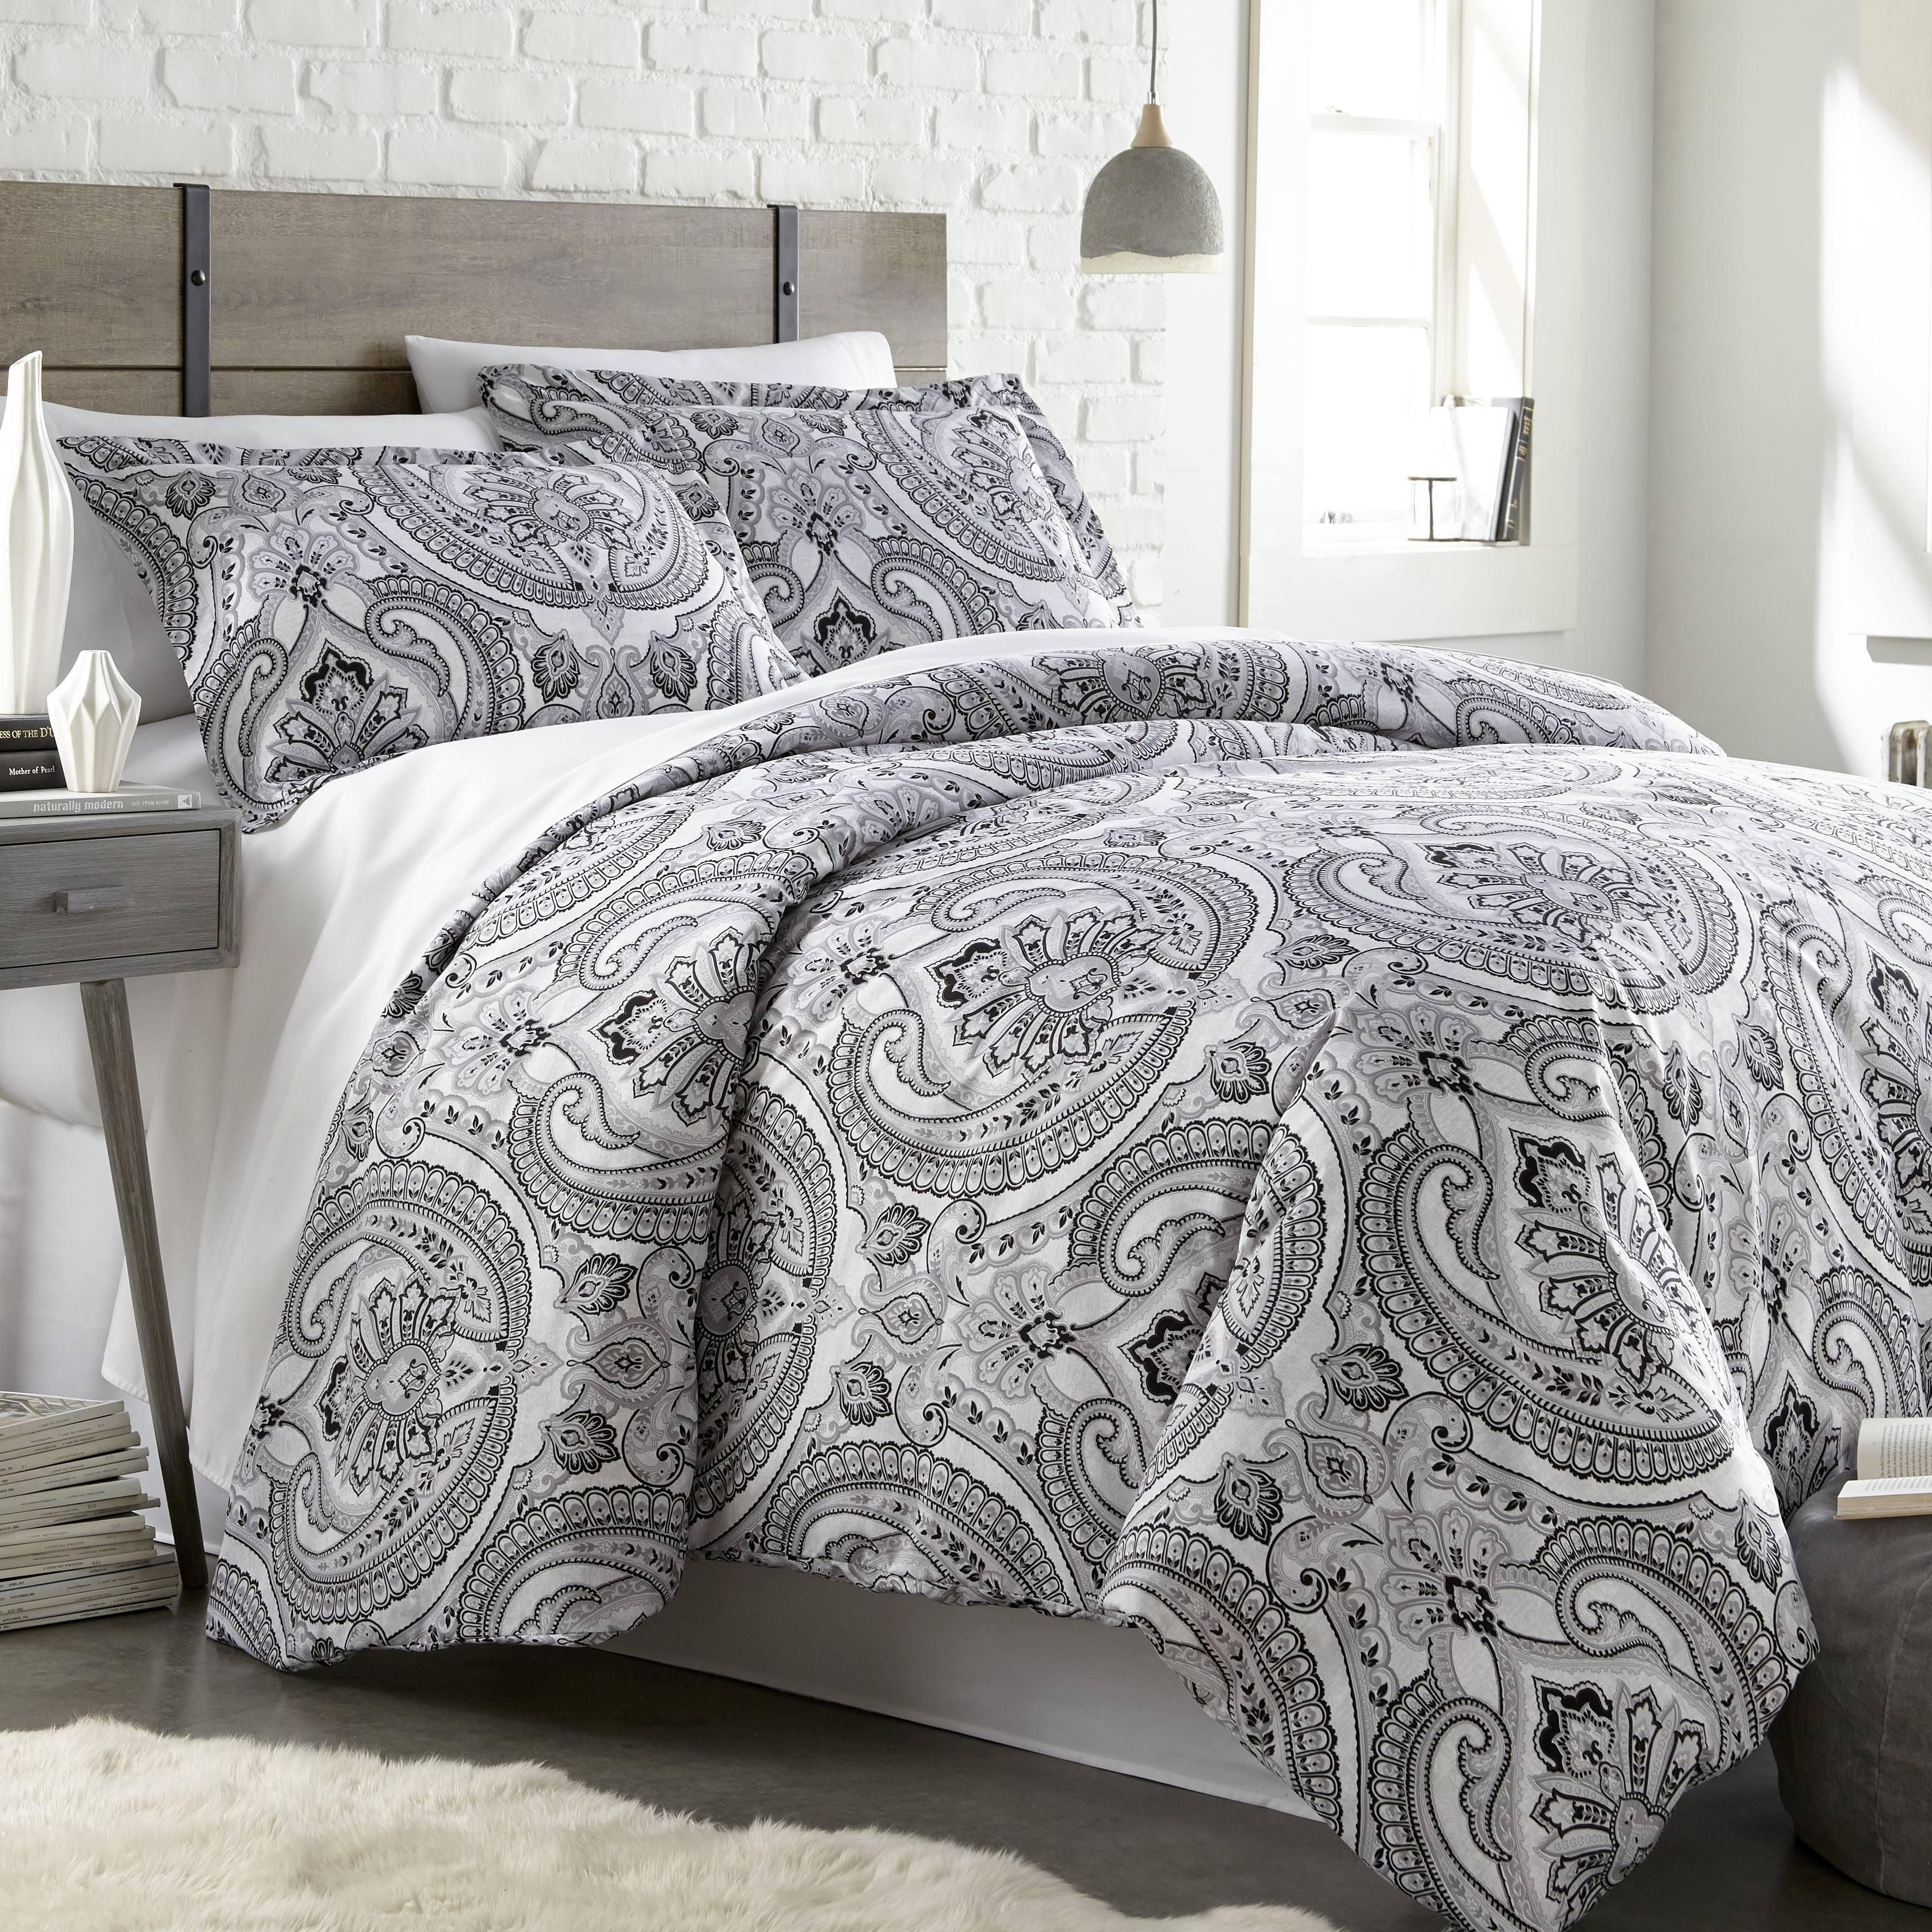 sheets bed sets linen winterdale pc set bedroom comforter furniture white bedding linens king